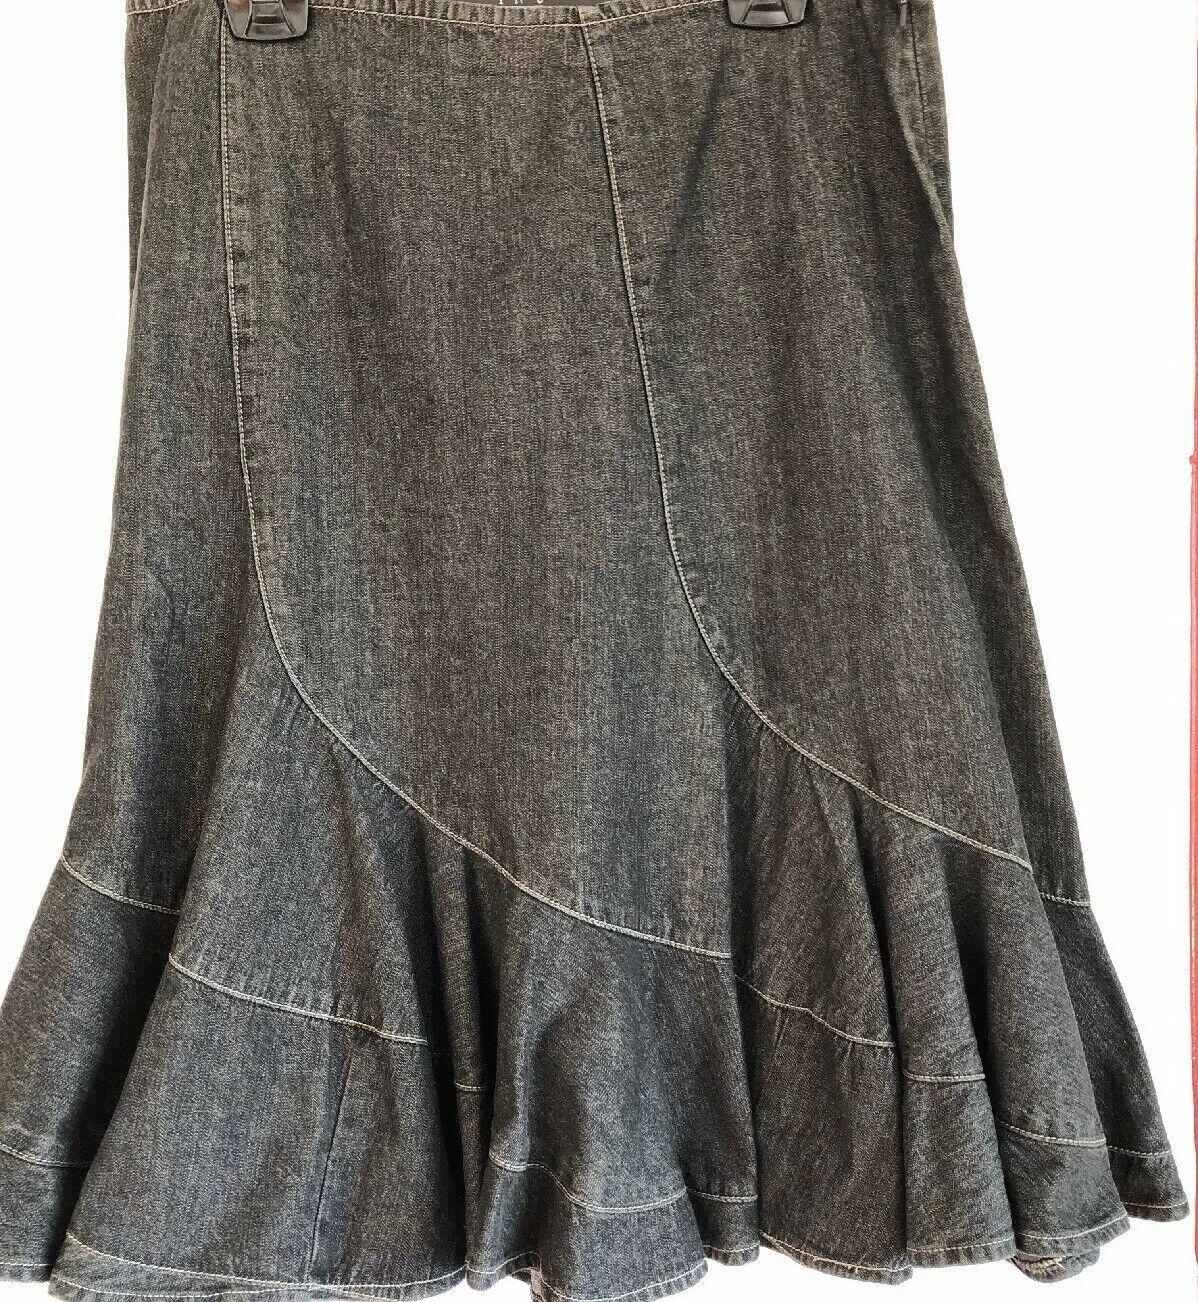 DKNY Jeans Skirt Side Zip 100% Cotton 14